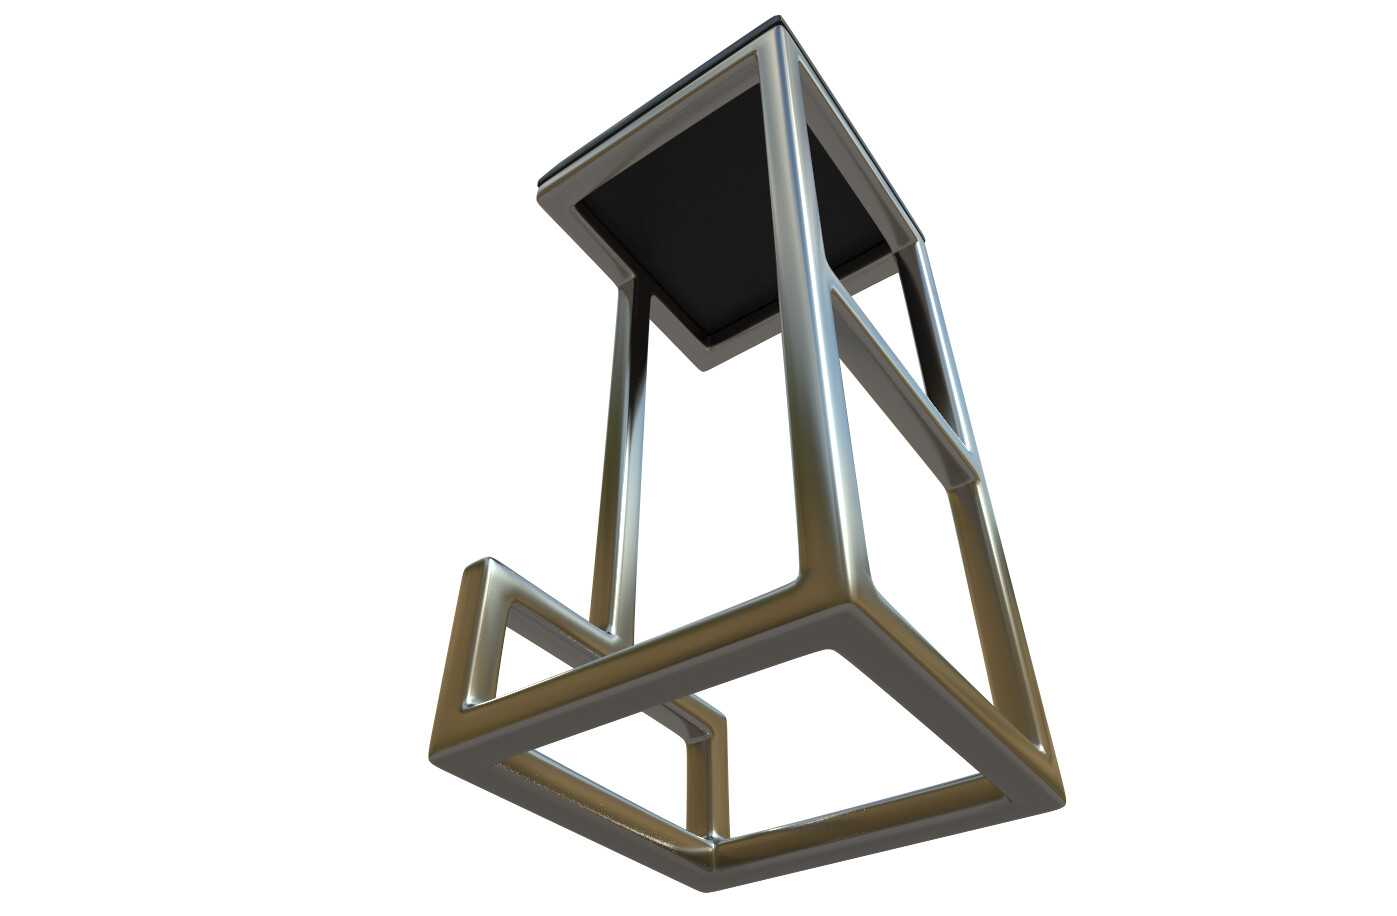 Joseph moniz designerbarstool001b